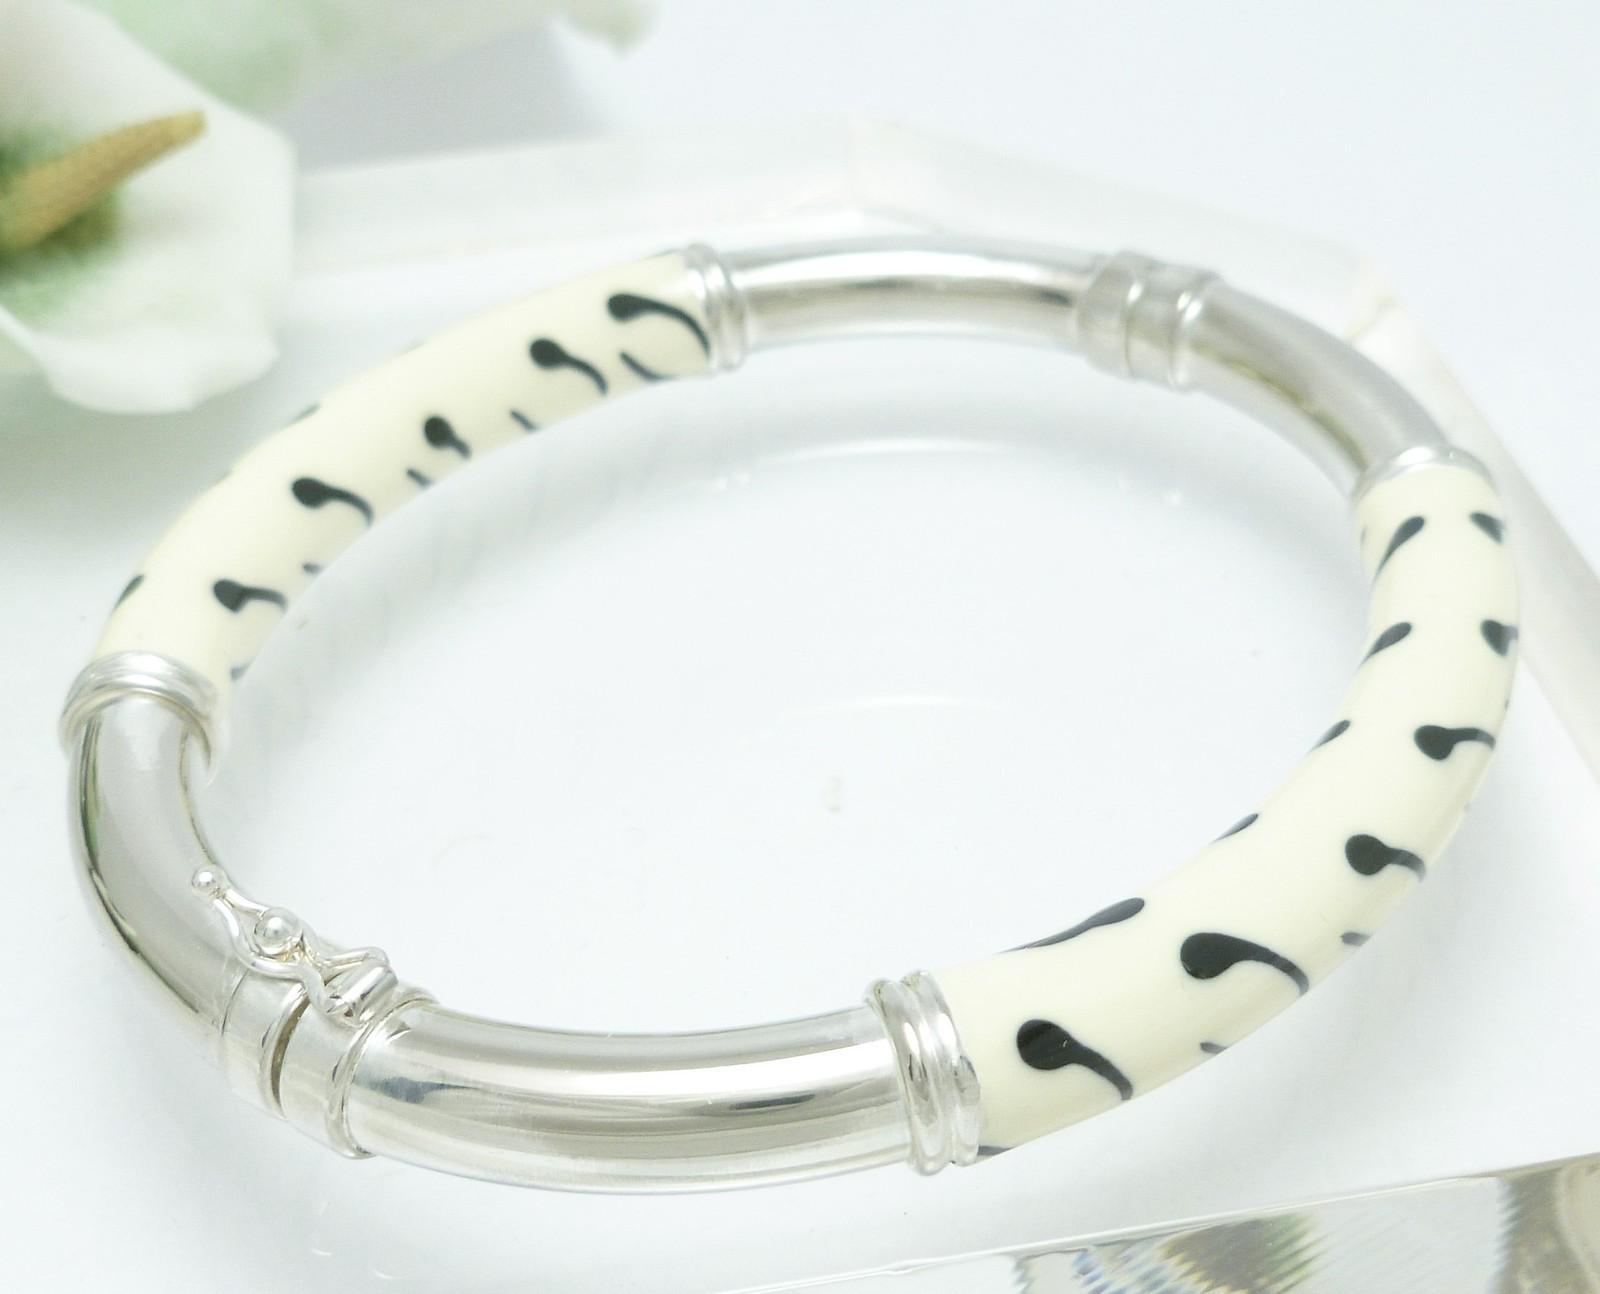 Sterling Enamel Zebra Print Bangle Bracelet Average Wrist Size 7 inch